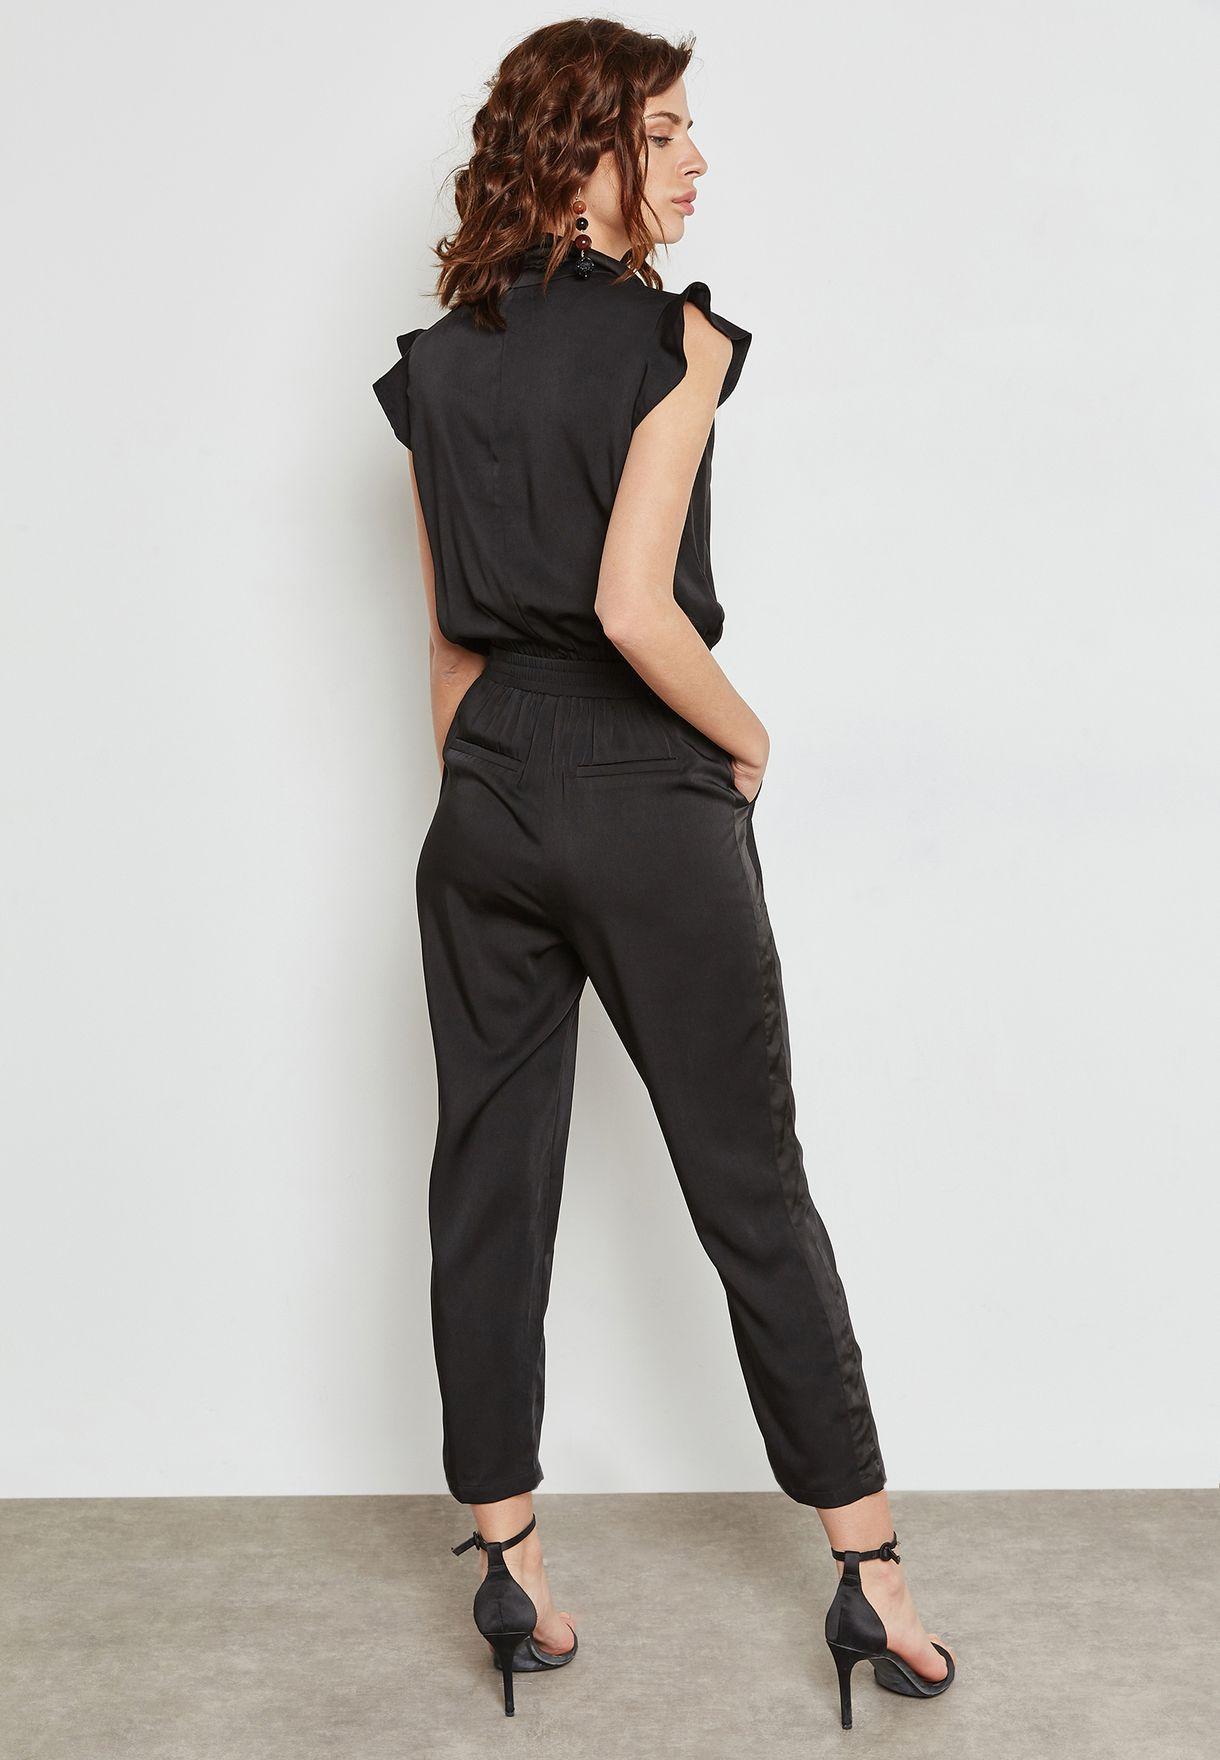 640a2c3f642 Shop Ella black Tuxedo Jumpsuit W1830 for Women in Qatar ...